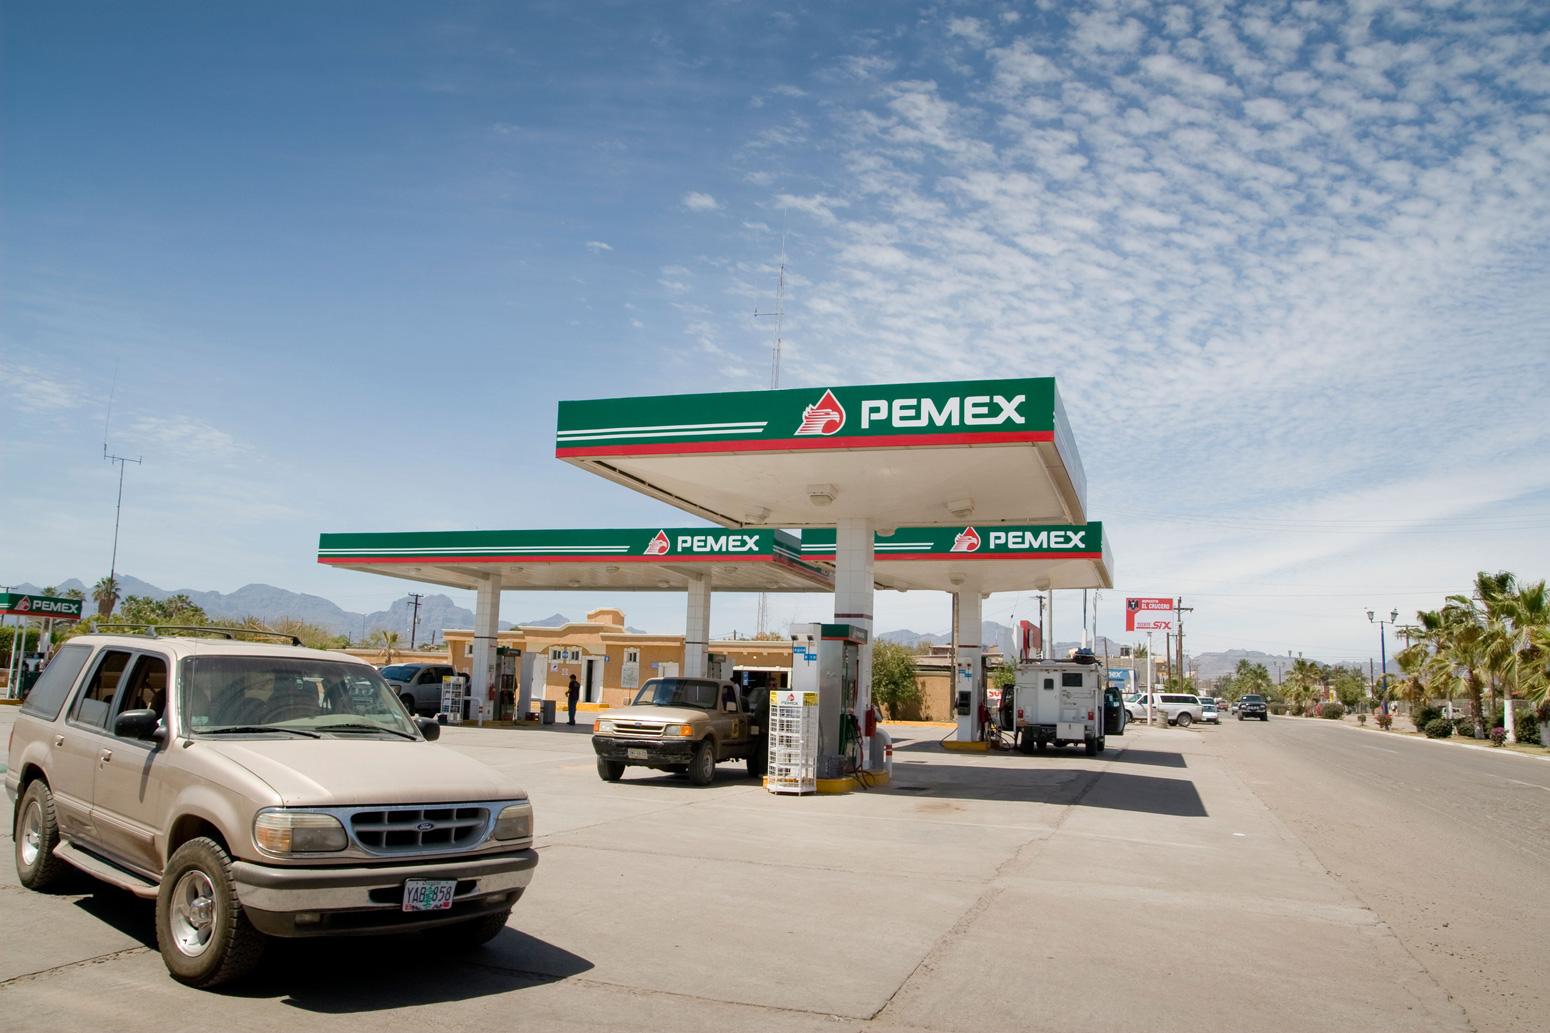 A Pemex station in Loreto, Mexico